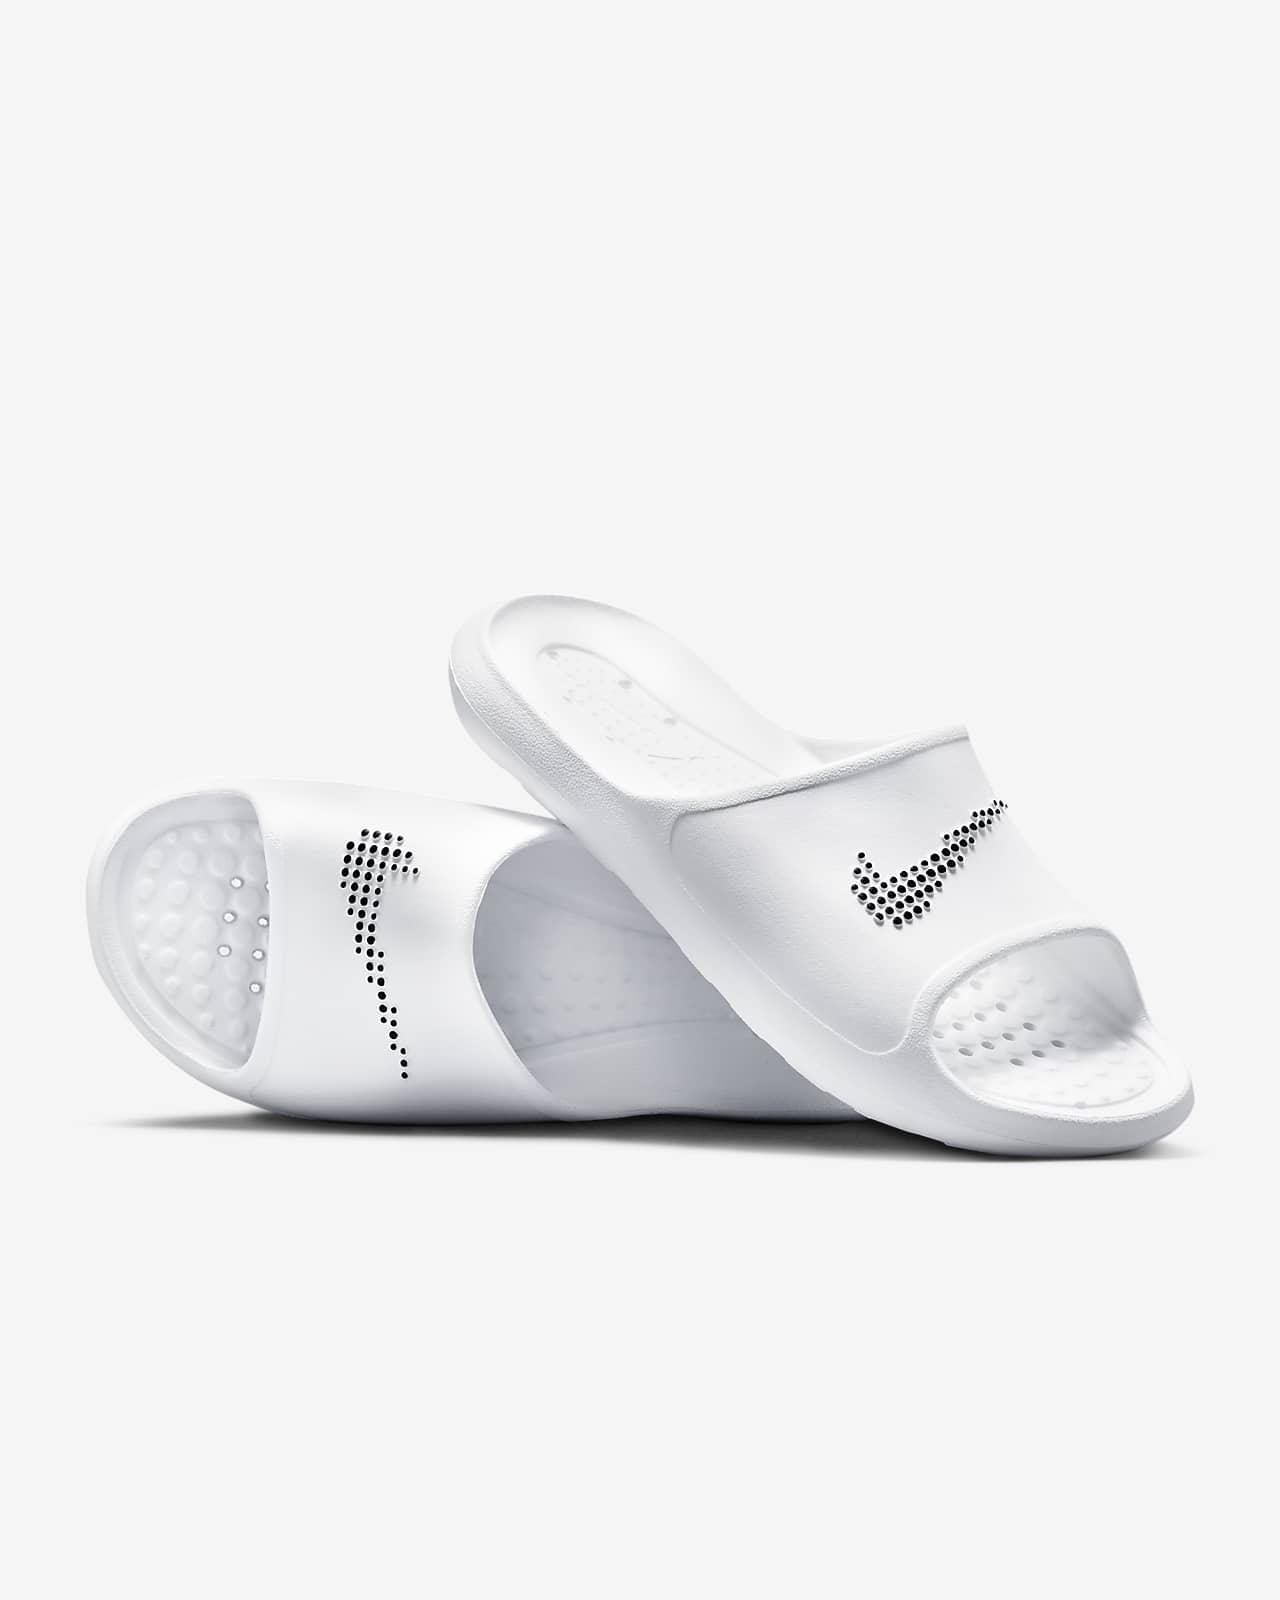 Nike Victori One Men's Shower Slides